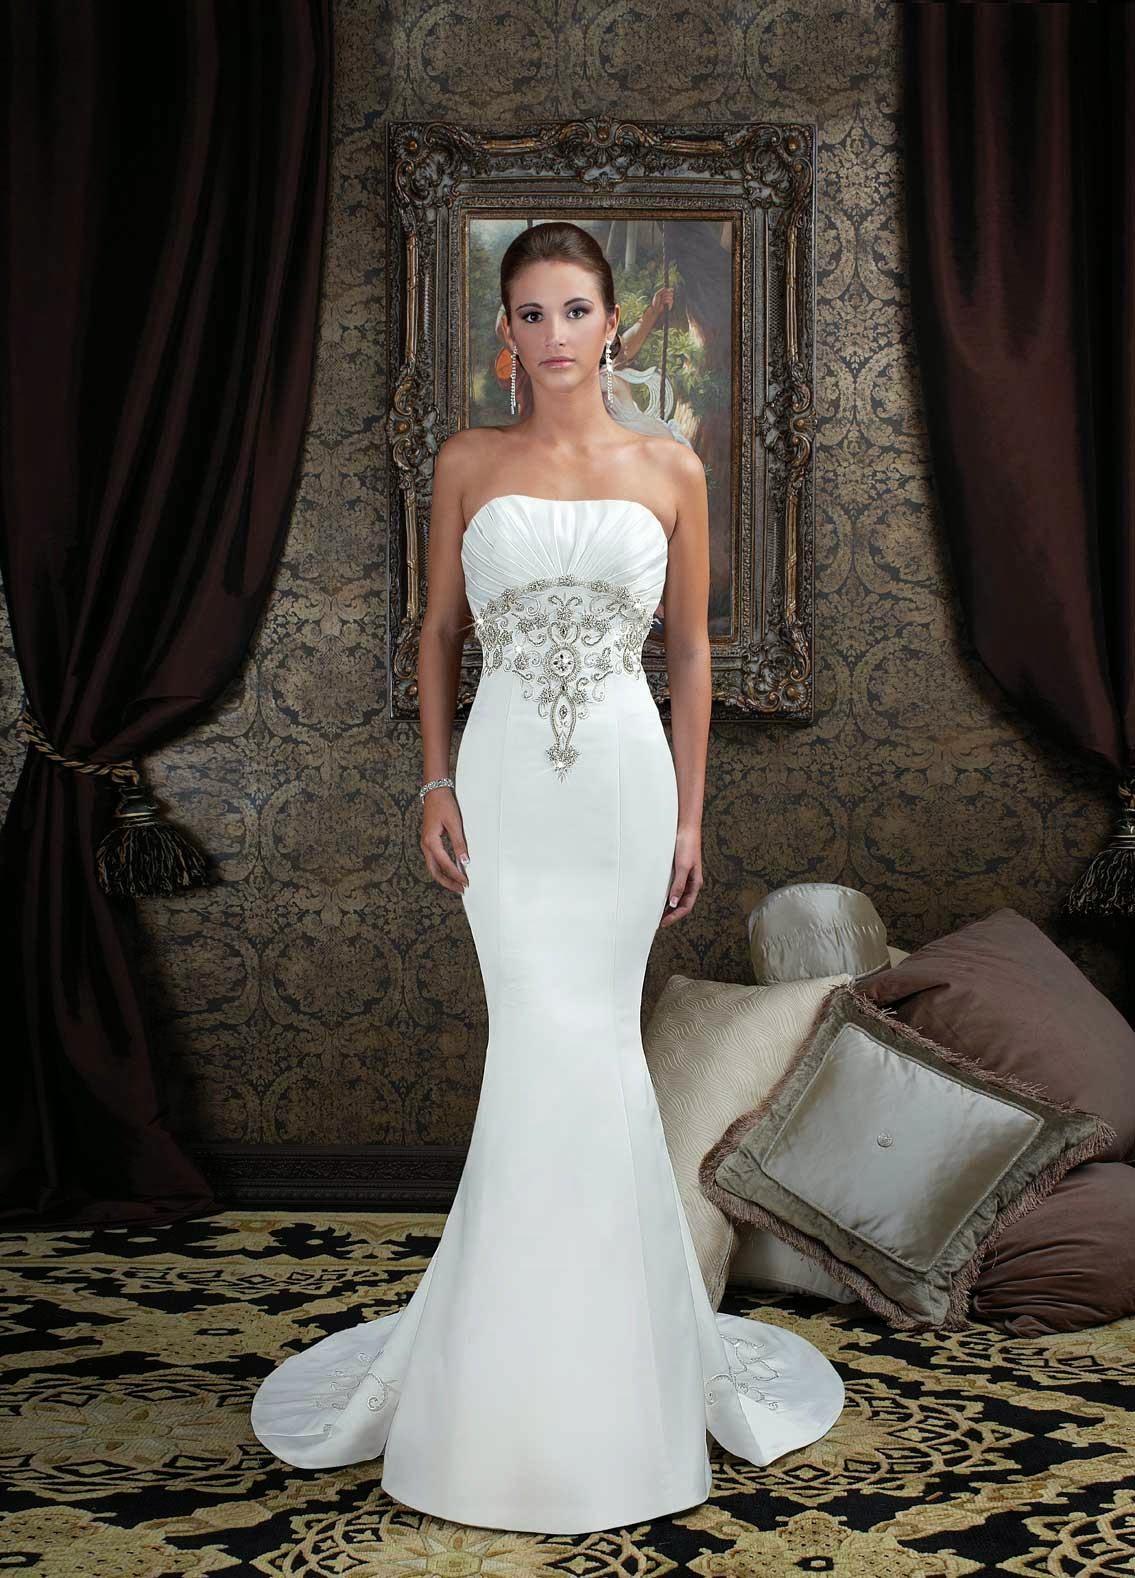 Wedding Industry: Wedding Dress of Your Dreams